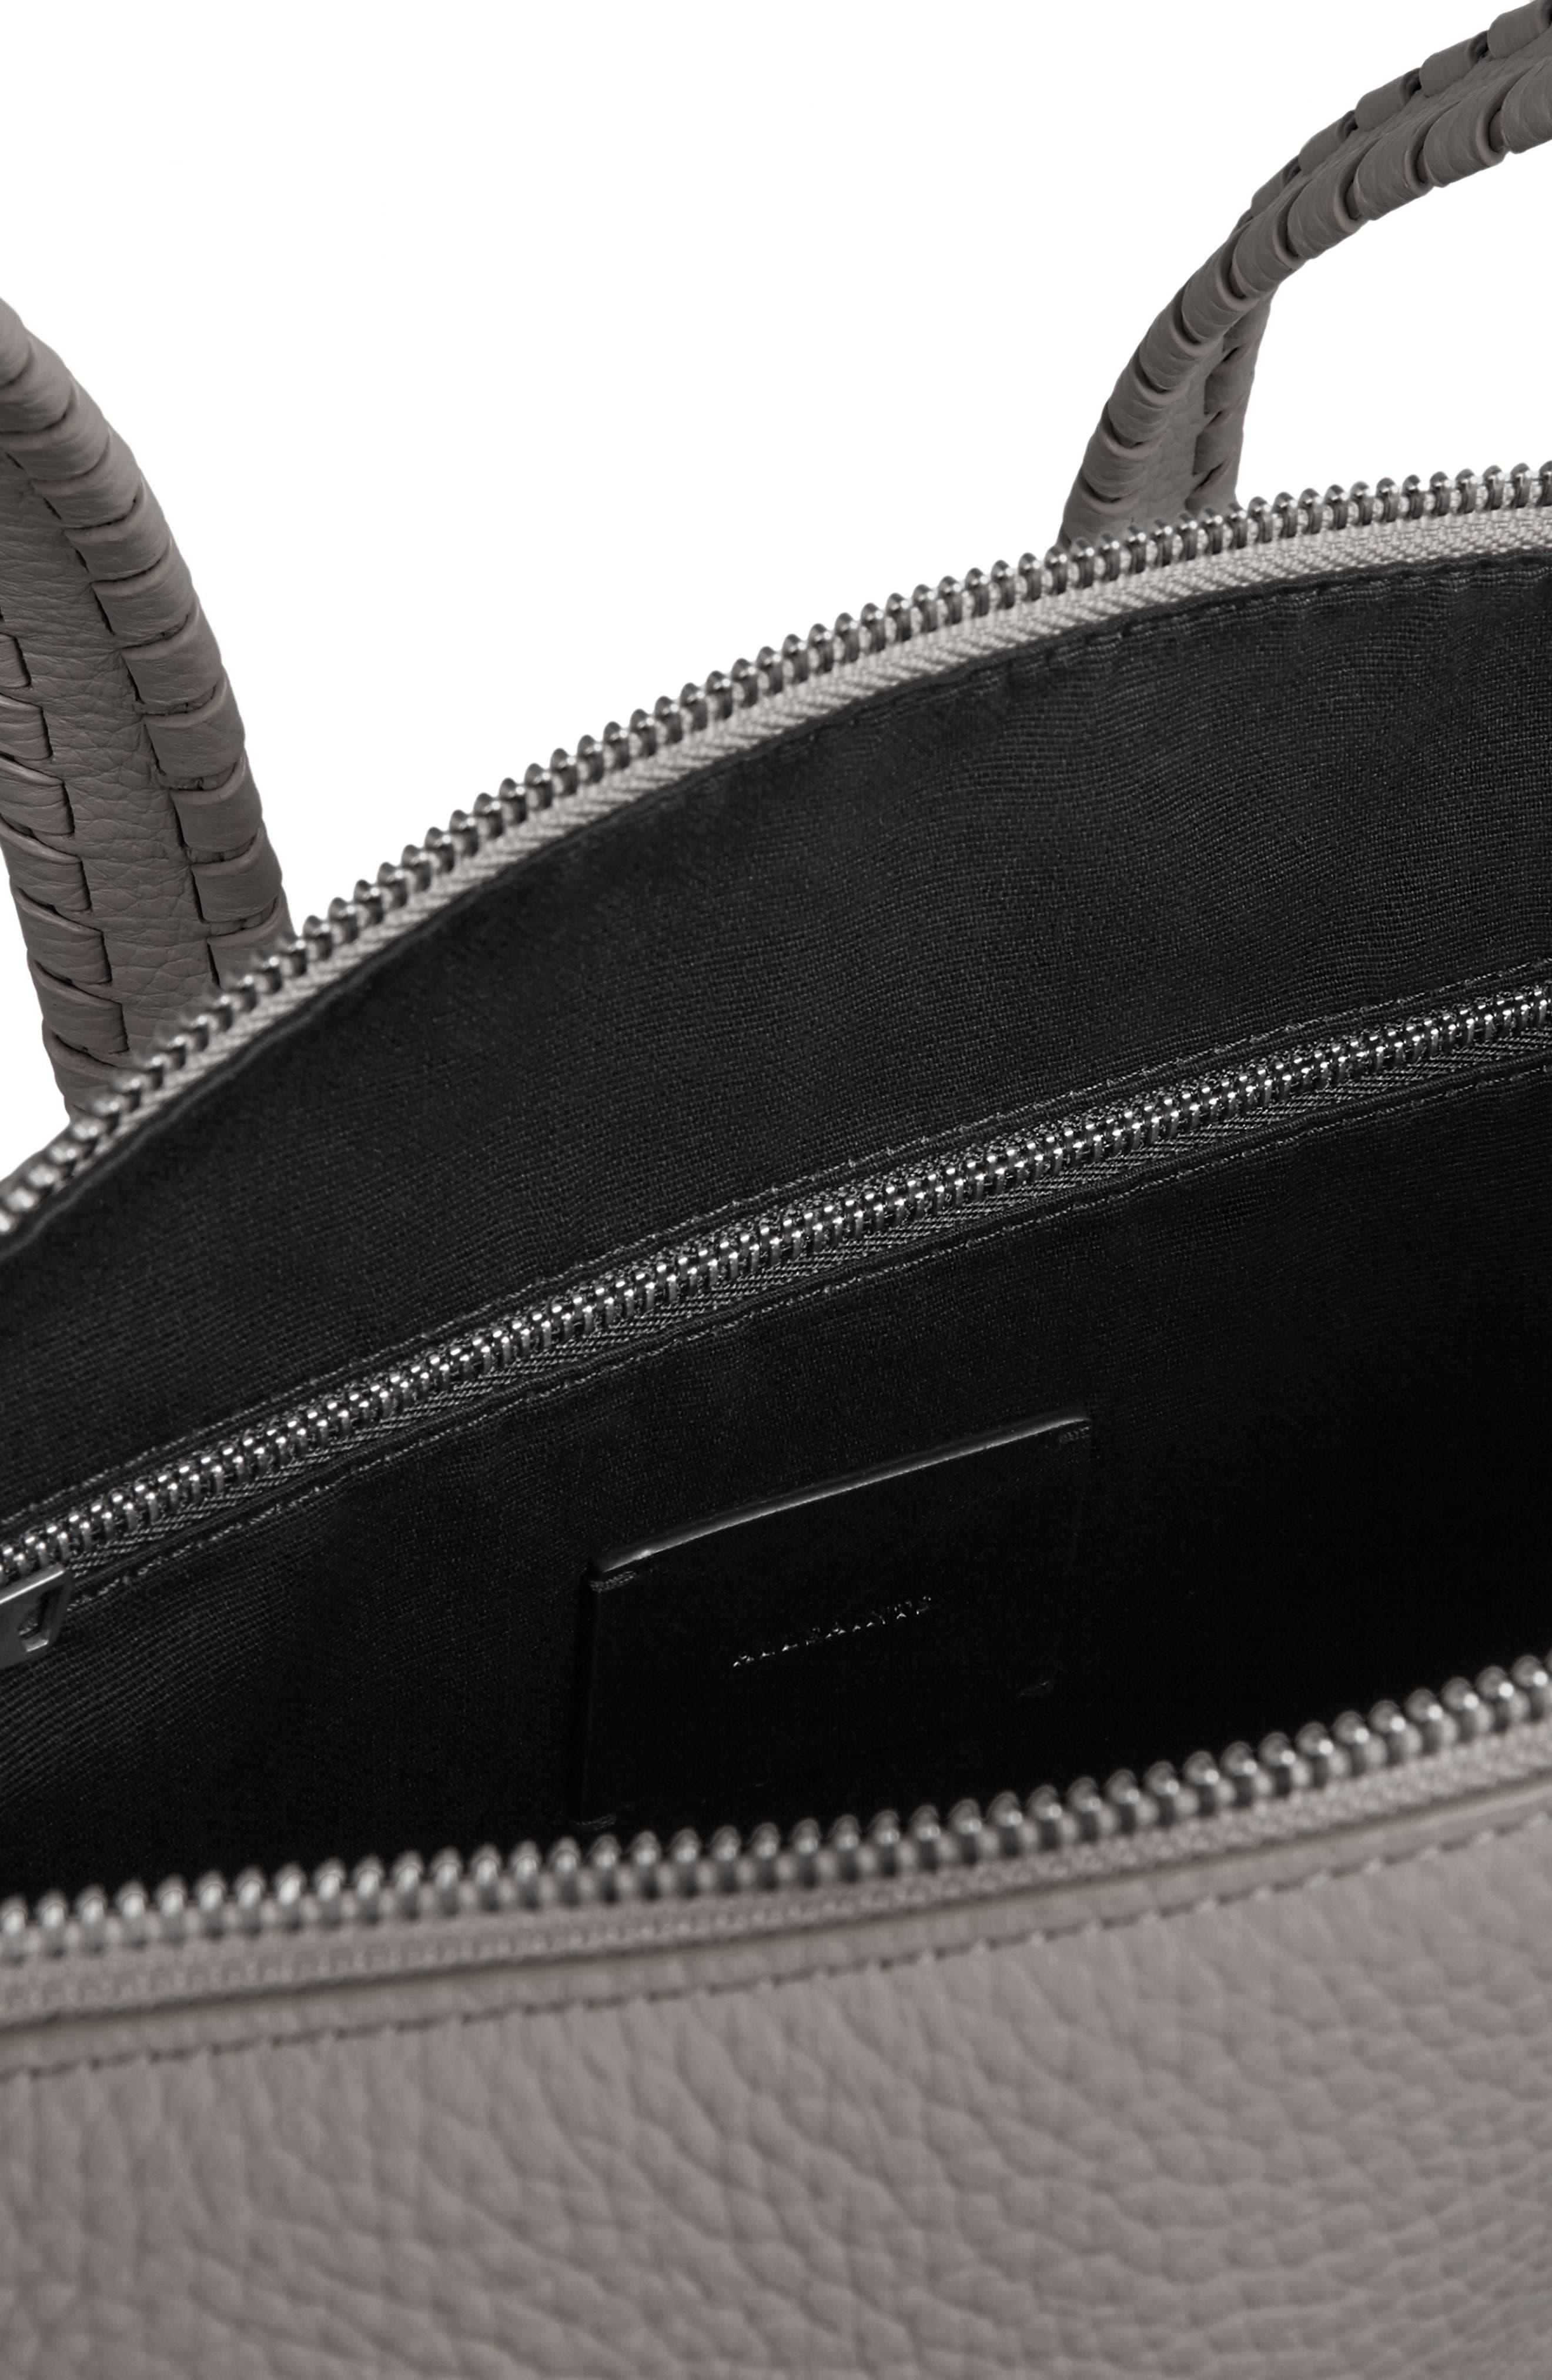 ALLSAINTS, Small Kita Convertible Leather Backpack, Alternate thumbnail 3, color, STORM GREY